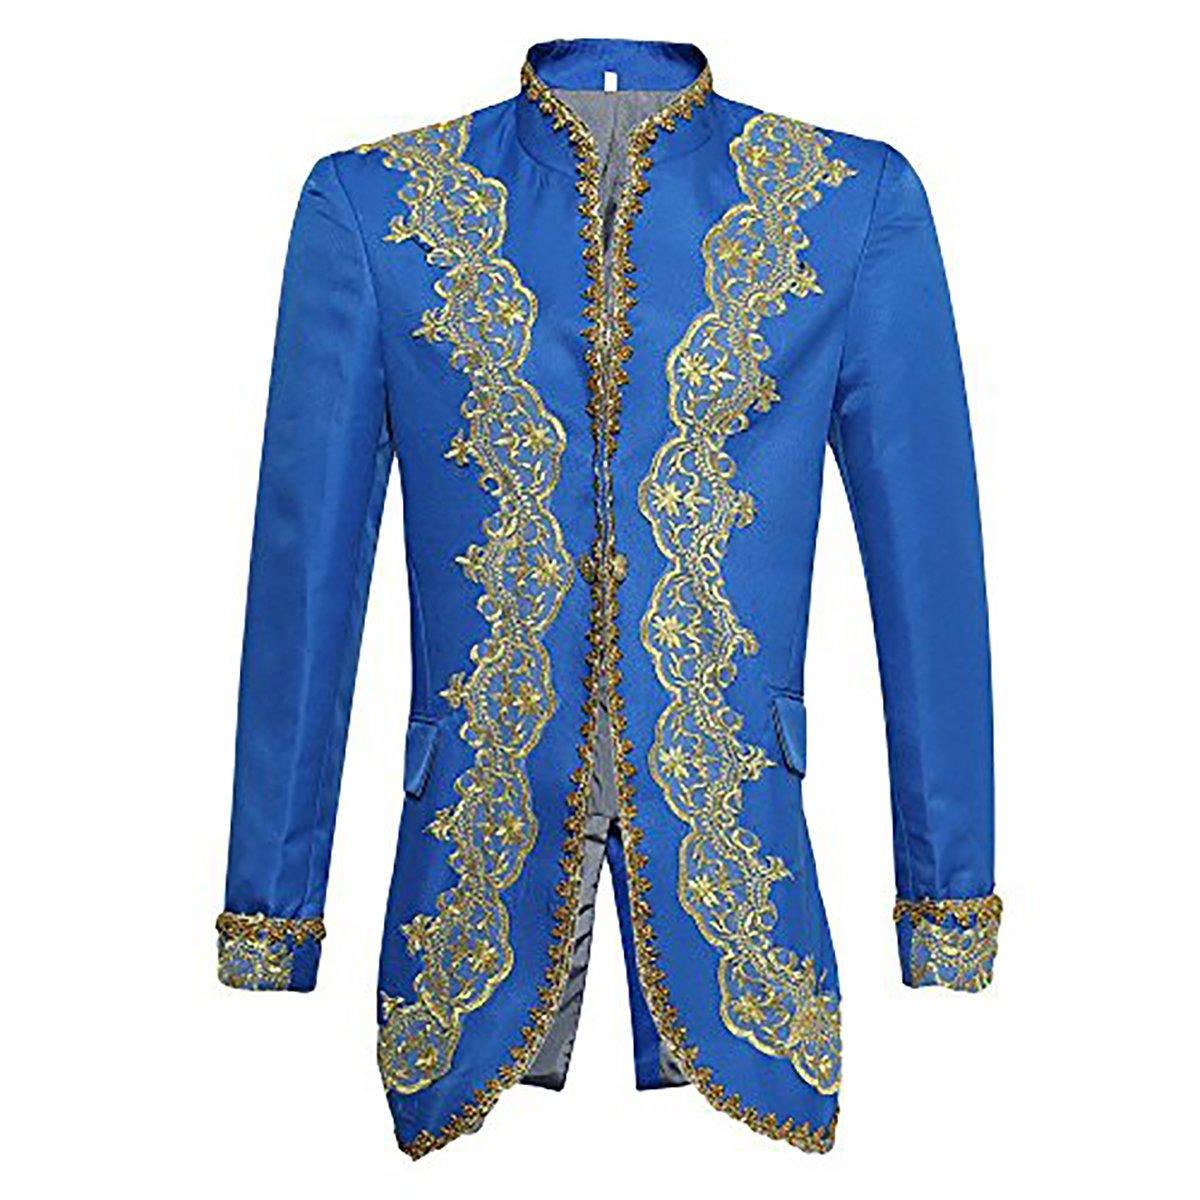 Completo da uomo, aderente e di grande stile, lussuoso, giacca, gilet e pantaloni Black S GTFHS0S